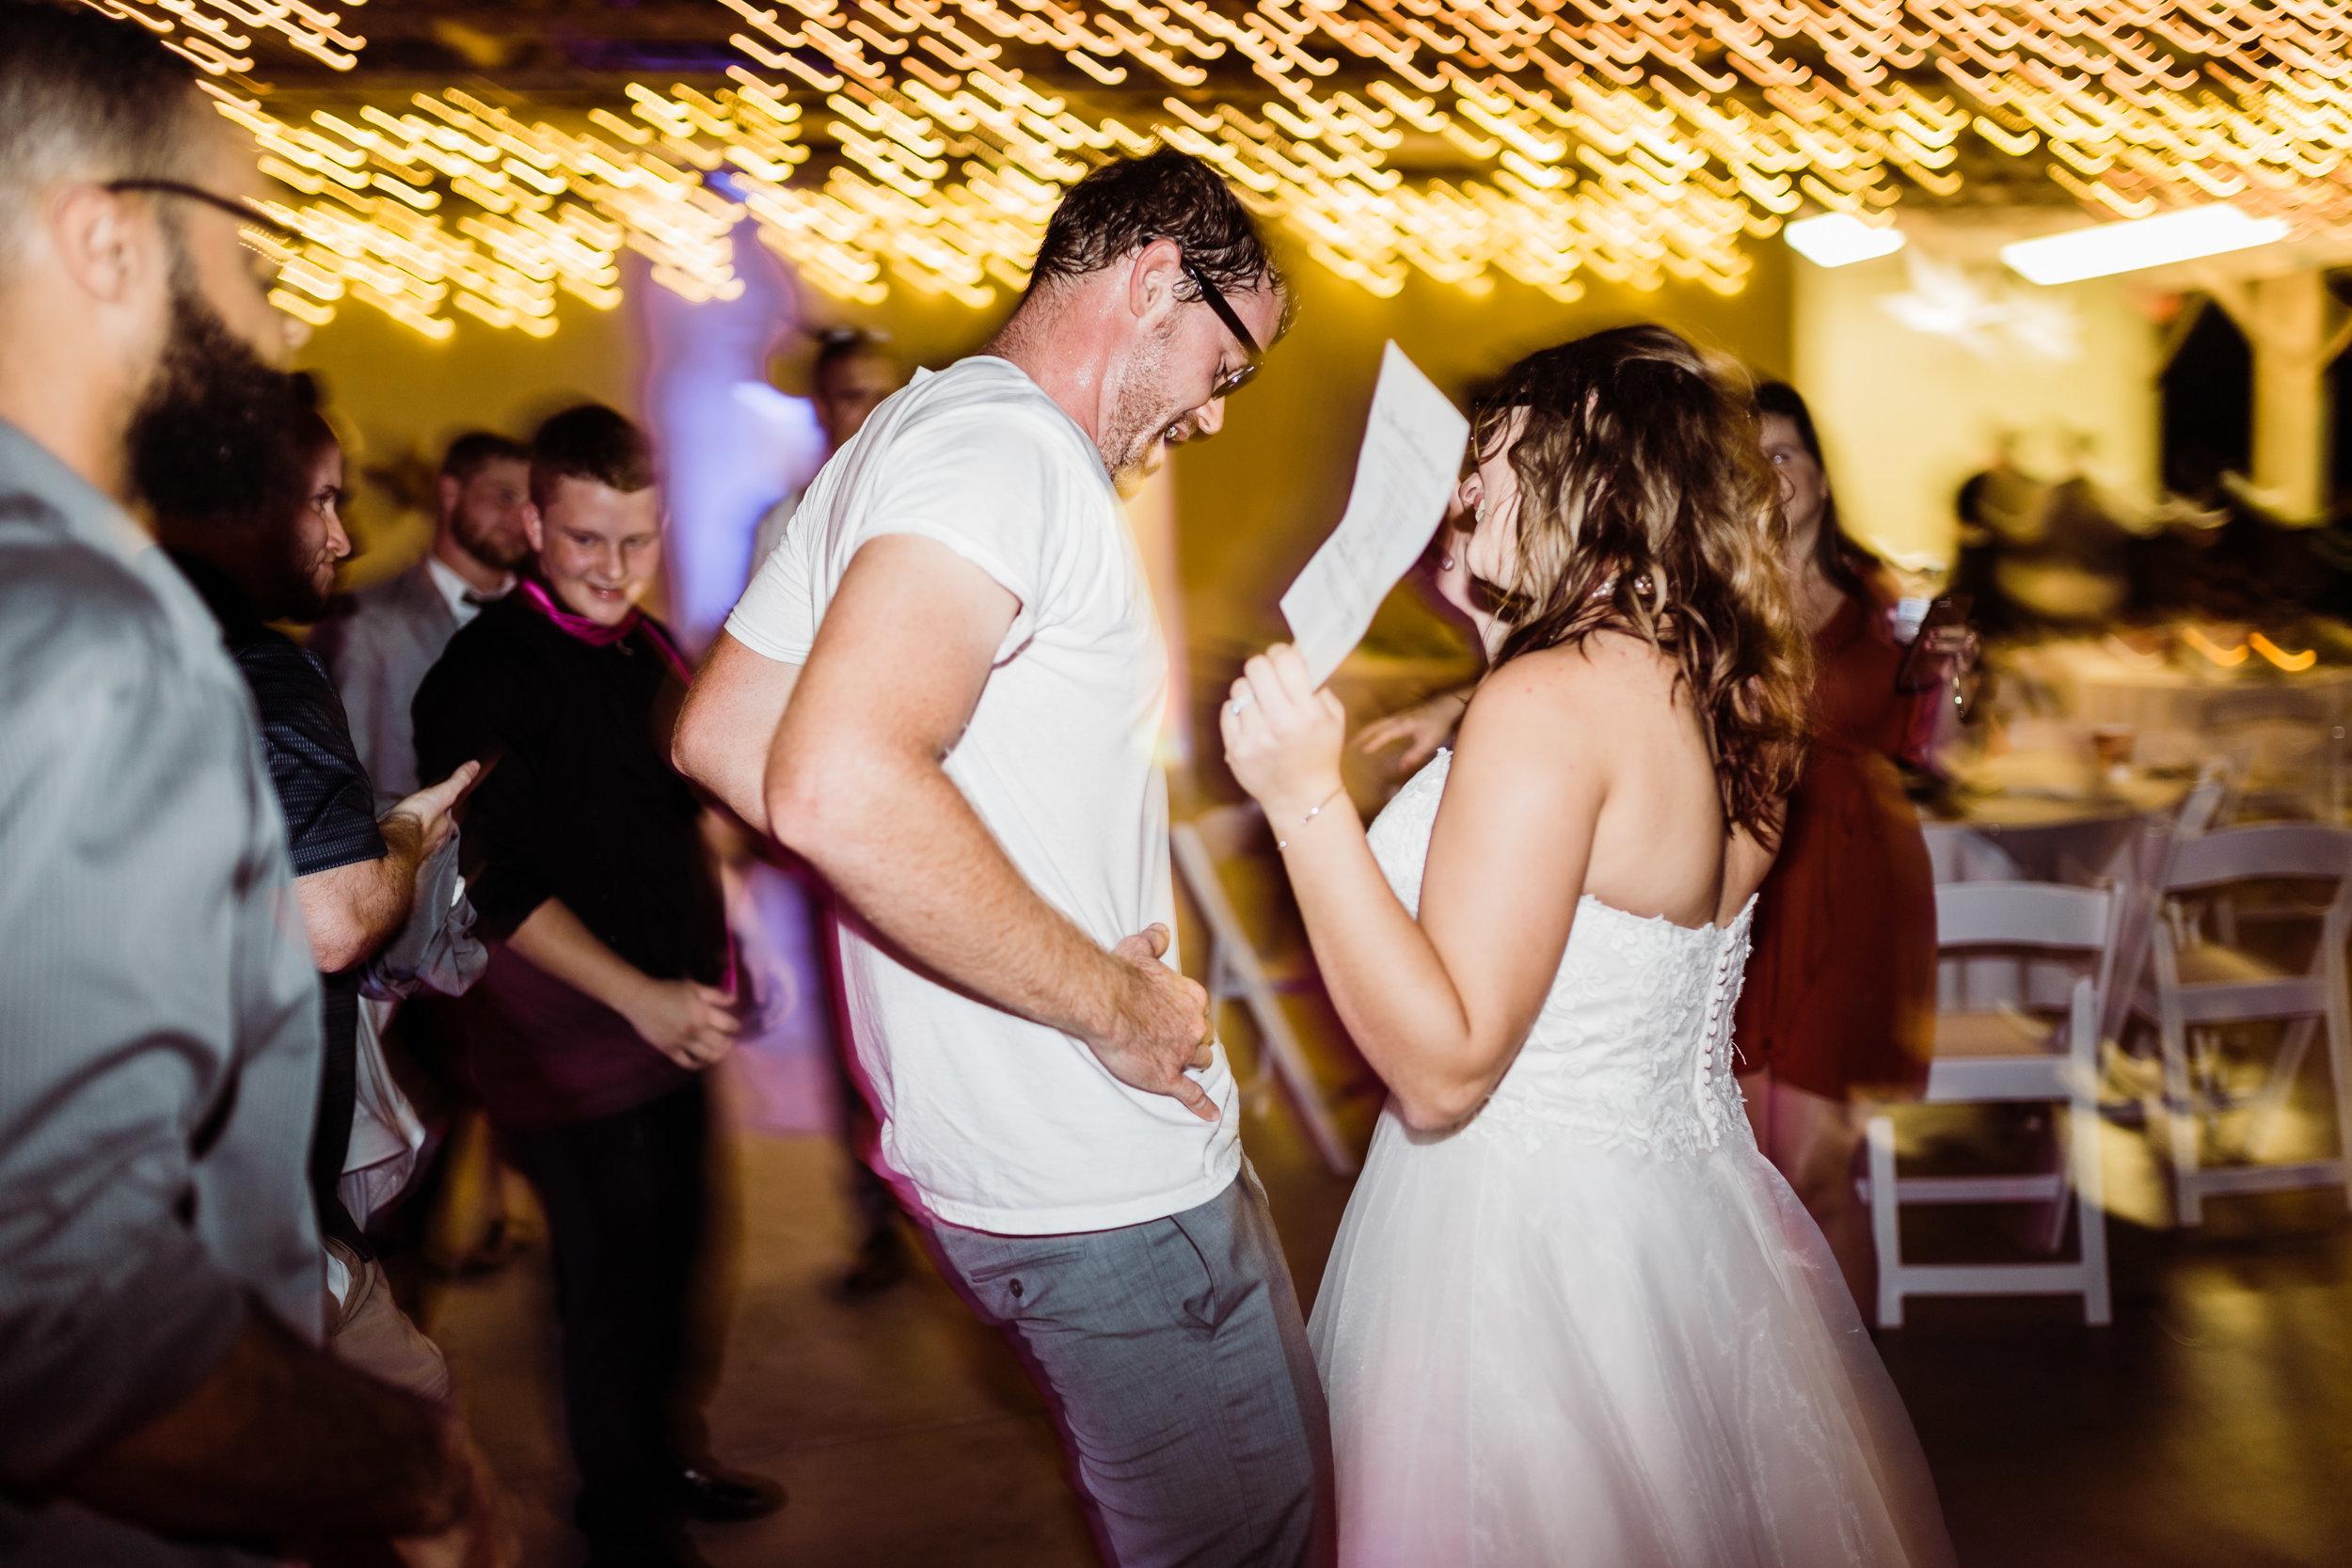 2017.10.14 Samantha and Matthew Crabtree Sarasota Wedding (674 of 708).jpg